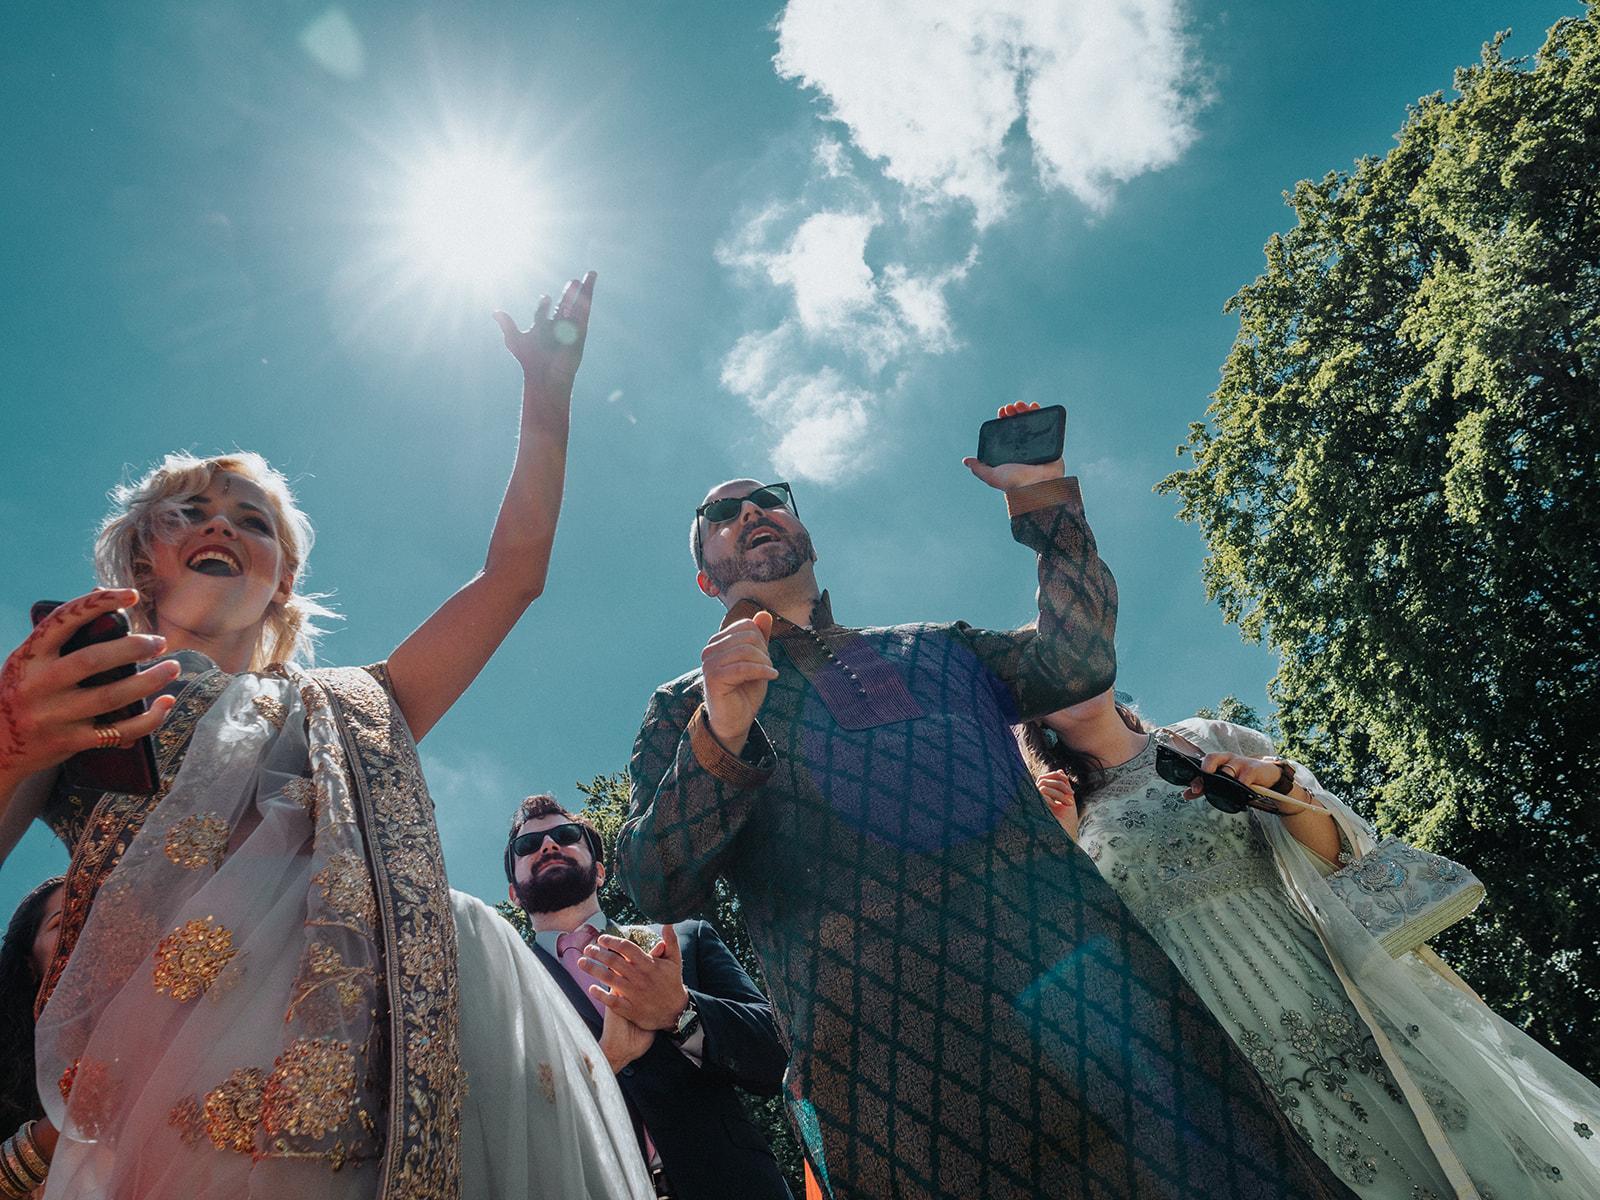 Fusion Wedding- Michael Briggs Photography- Multifaith Wedding- English Indian Wedding- Unconventional Wedding- Wedding Photography- Unique Wedding Ideas- Indian Bridalwear- Unique Bridalwear- Quirky Wedding- Wedding Planning